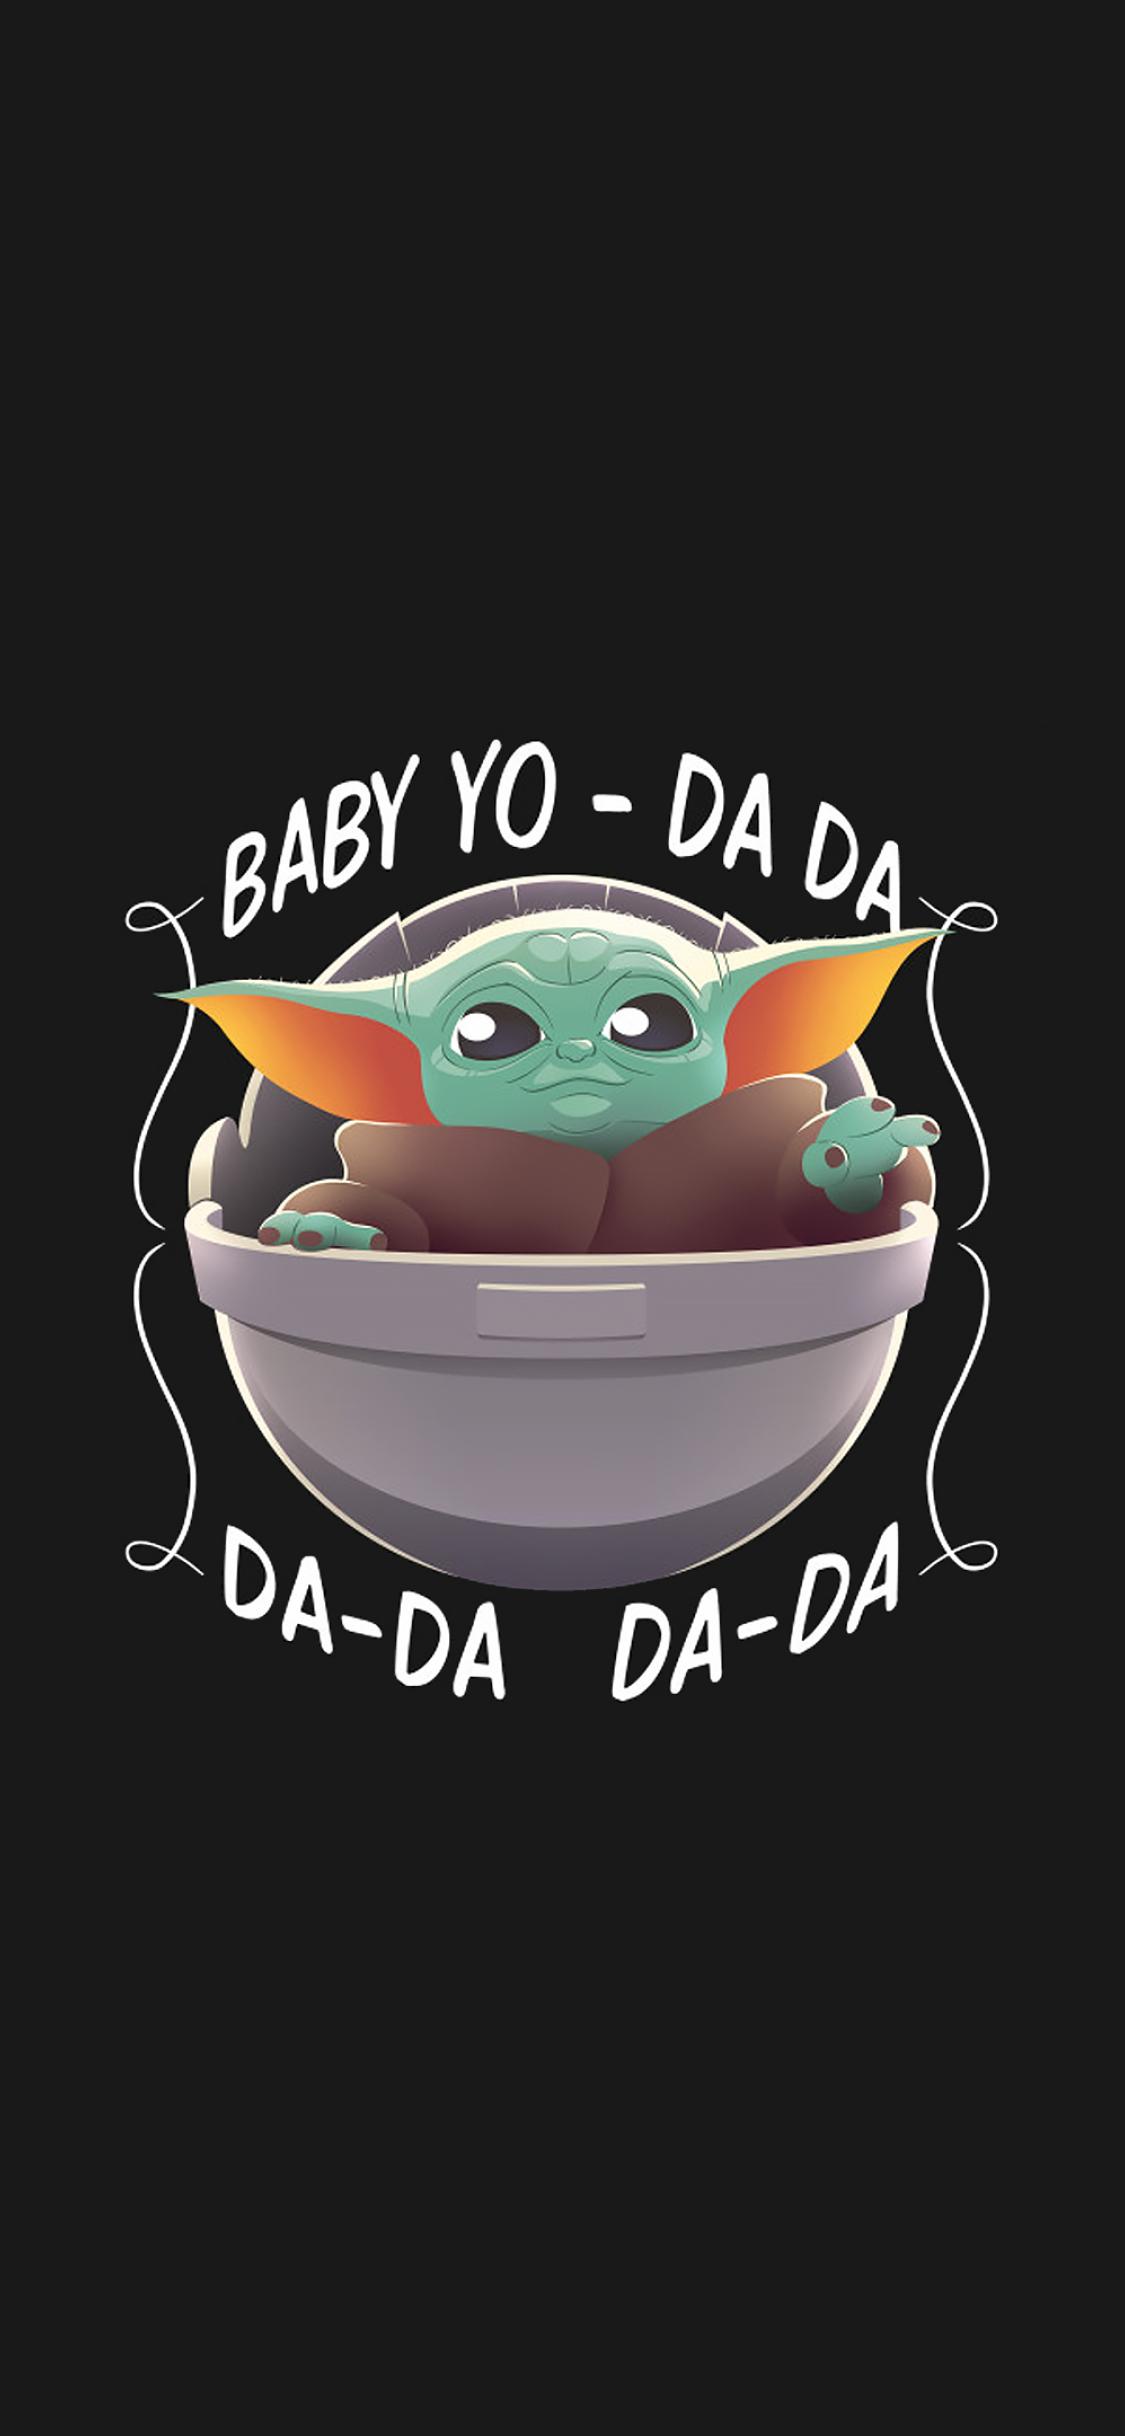 1125x2436 Cool Baby Yoda Minimalist Iphone XS,Iphone 10 ...